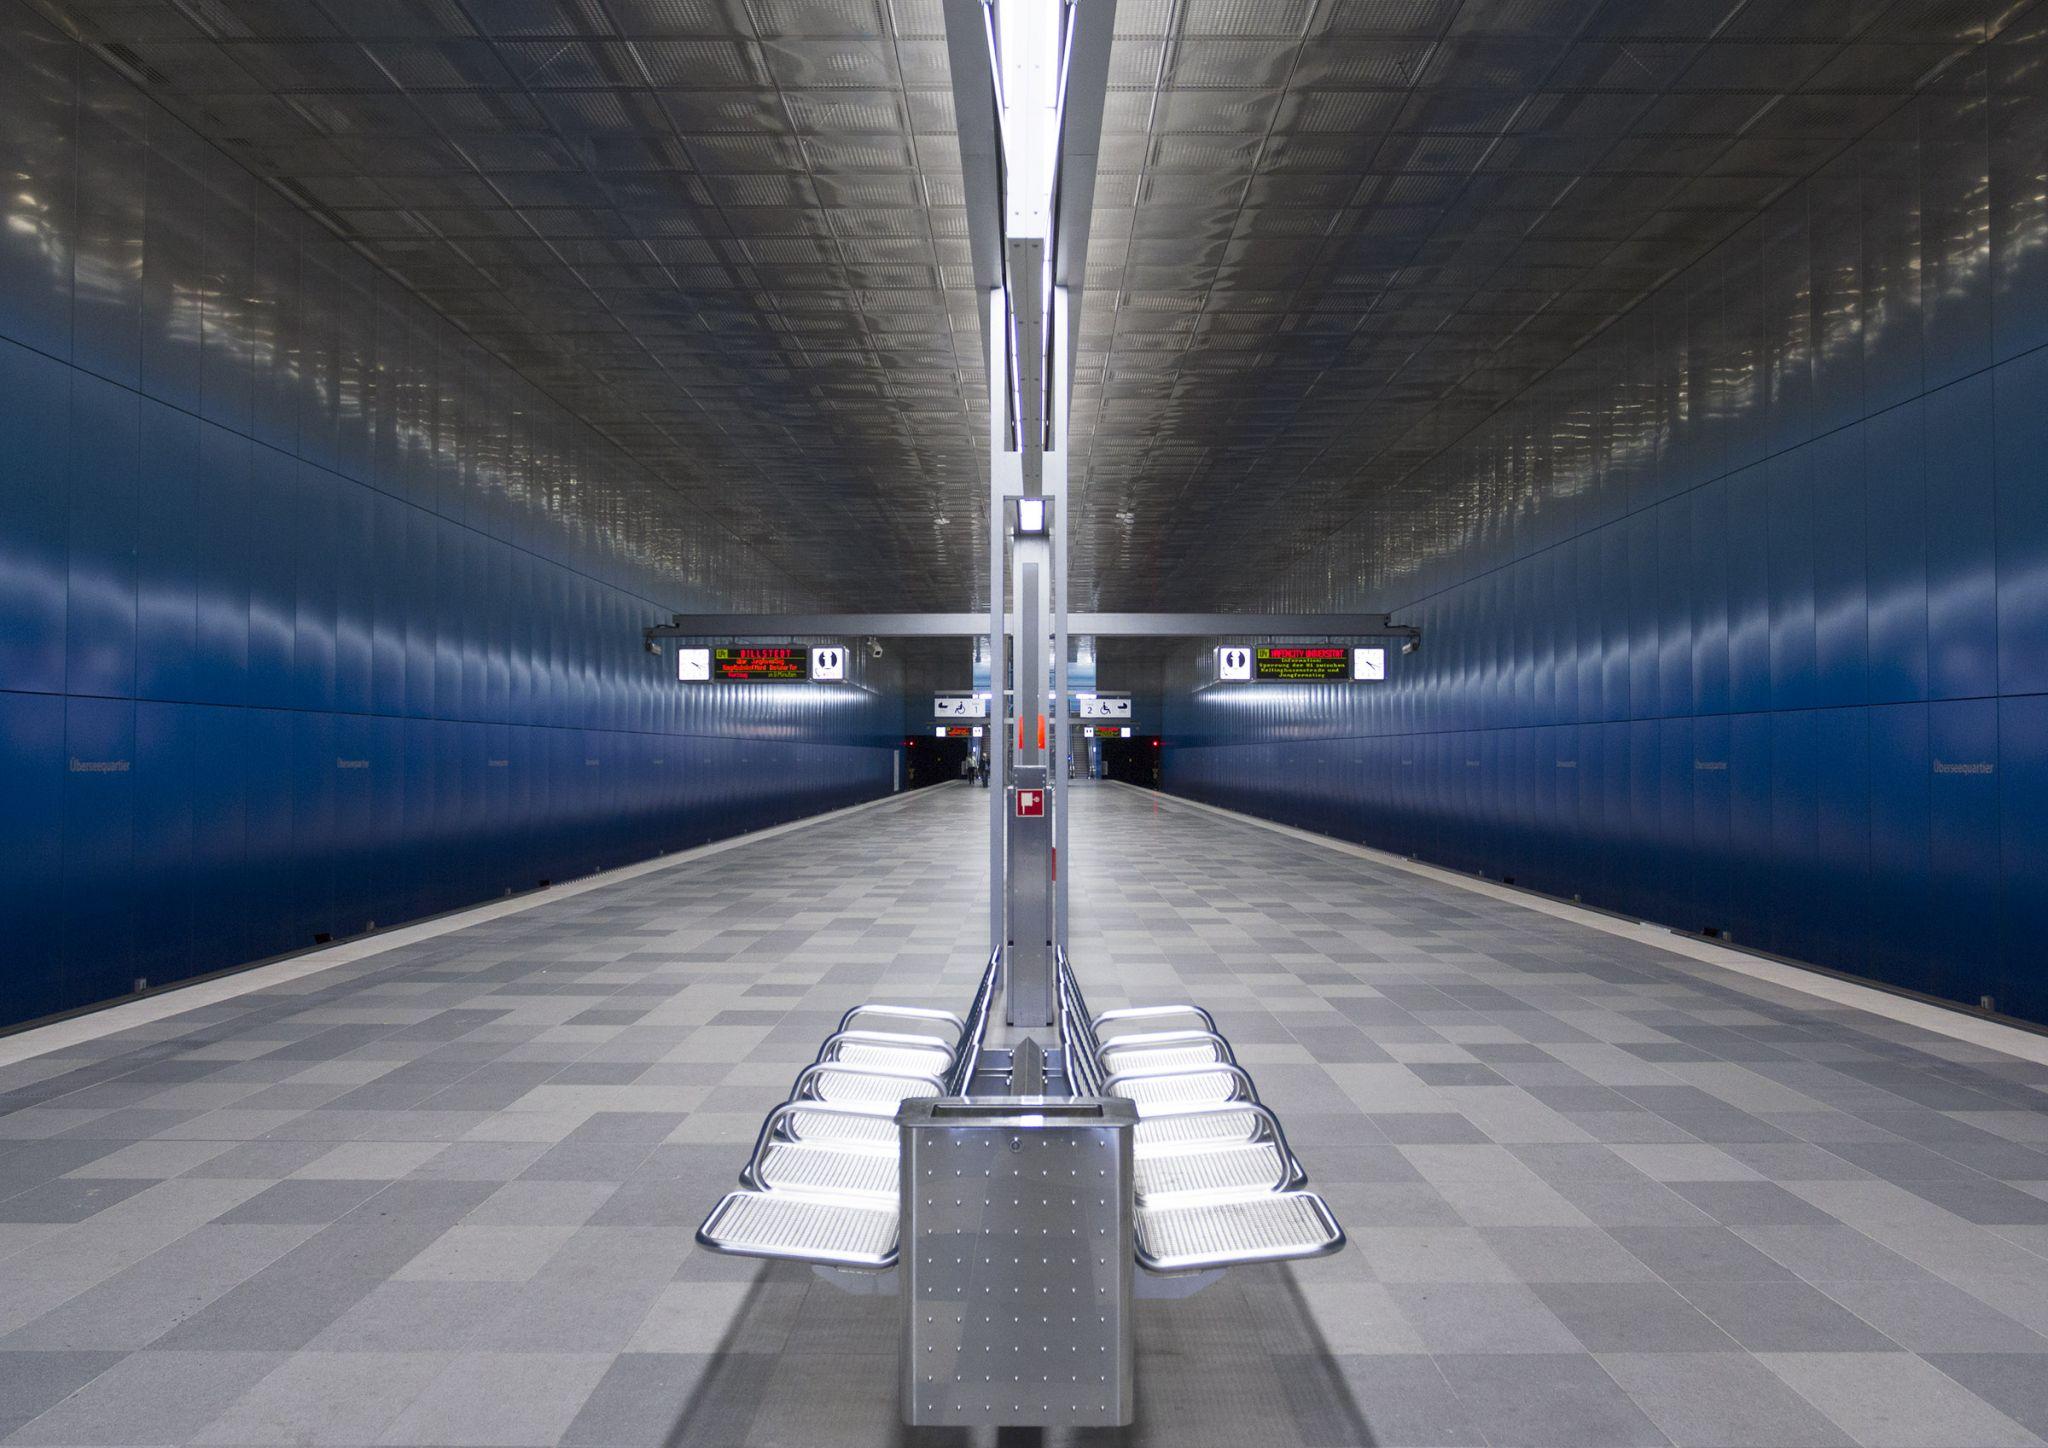 Überseequartier - Subway Station, Germany